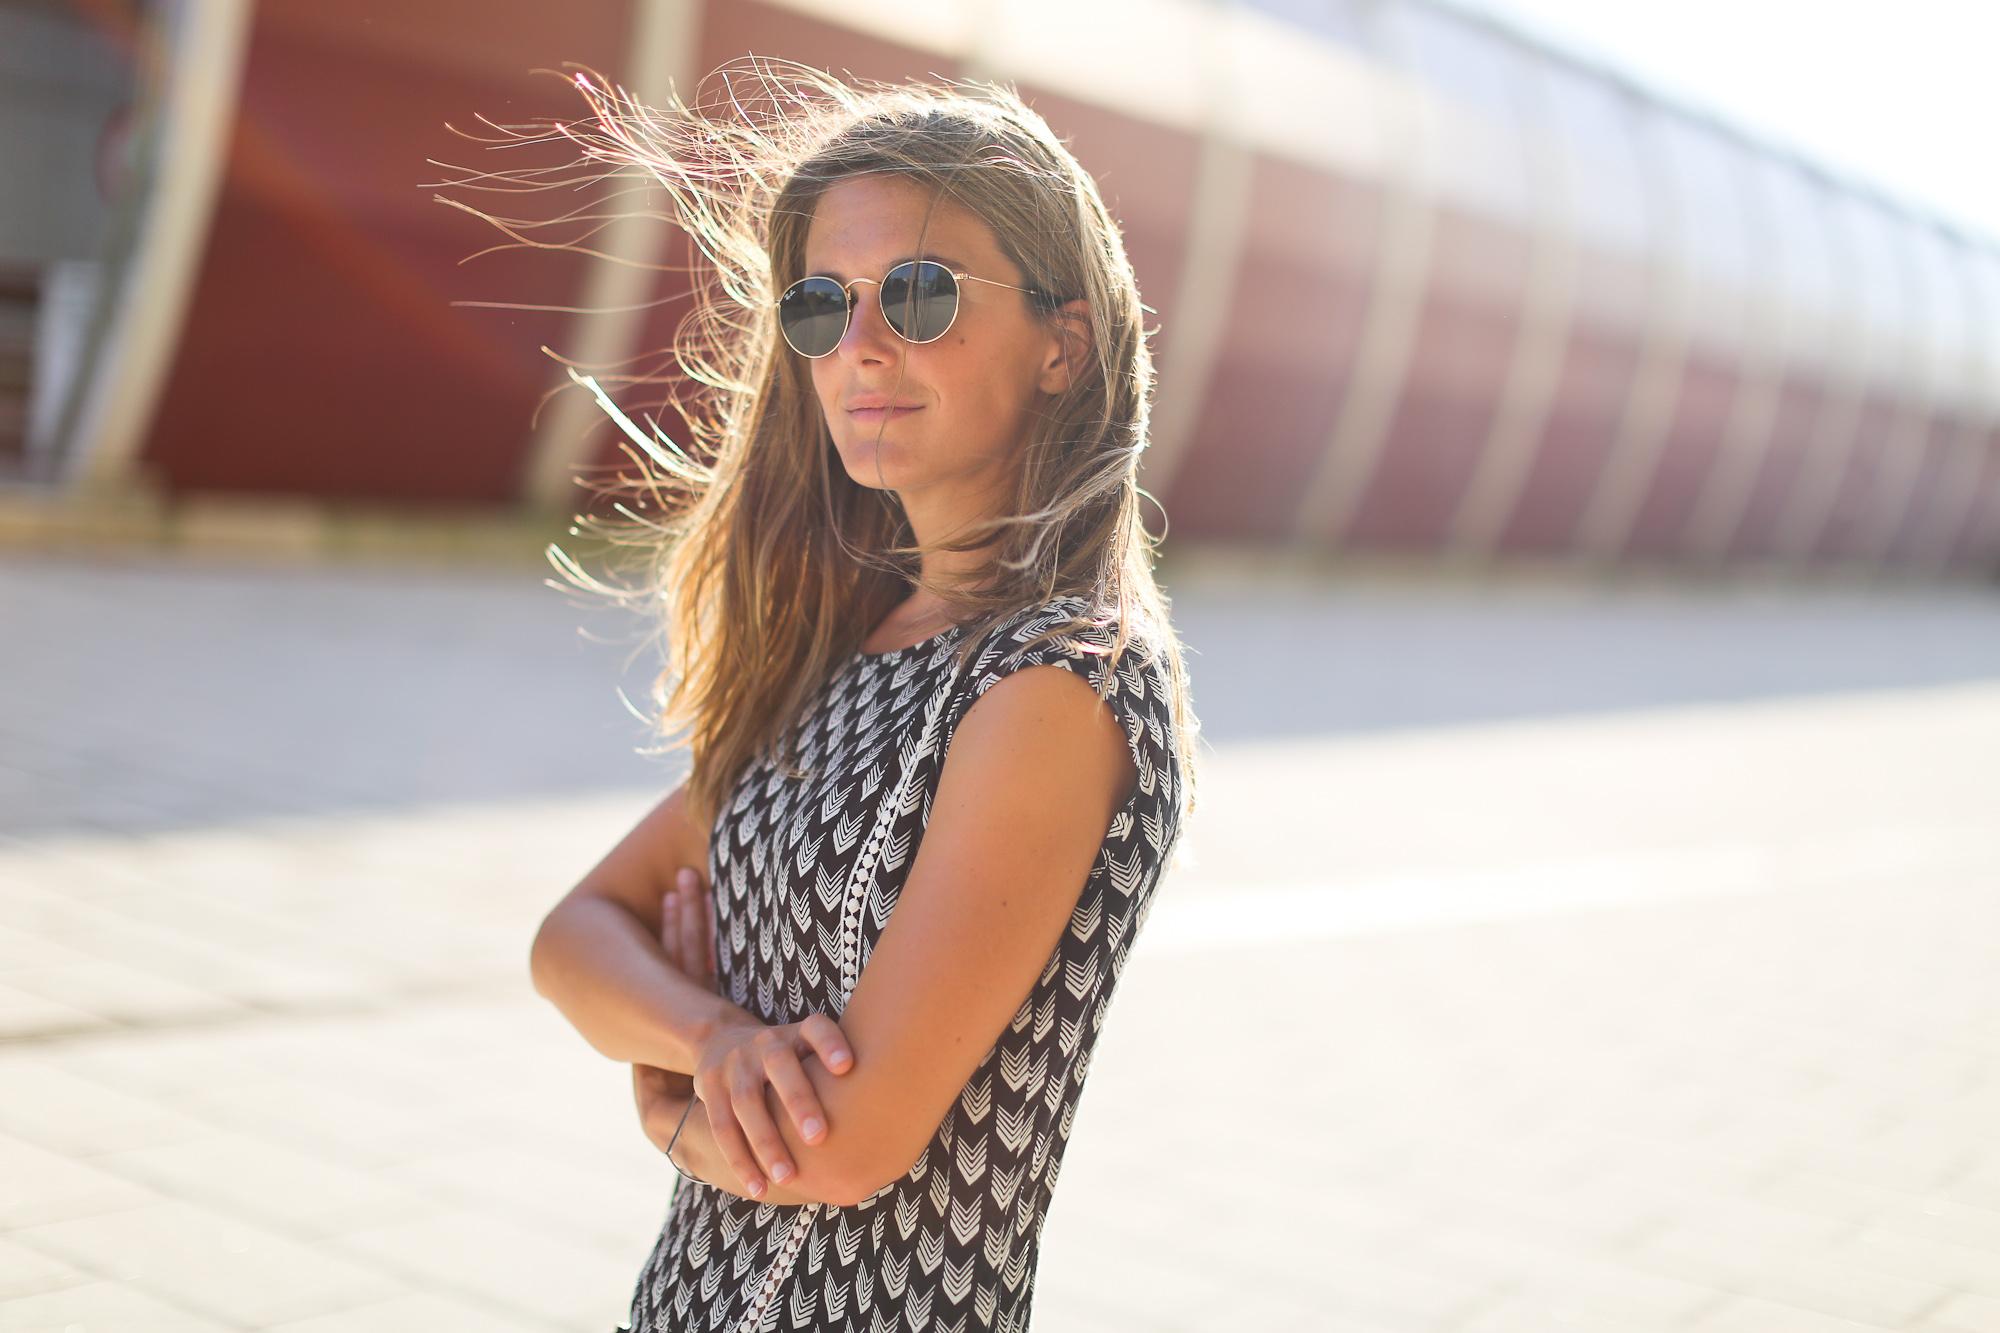 Clochet_streetstyle_chicwish_midi_printed_summer_dress-11